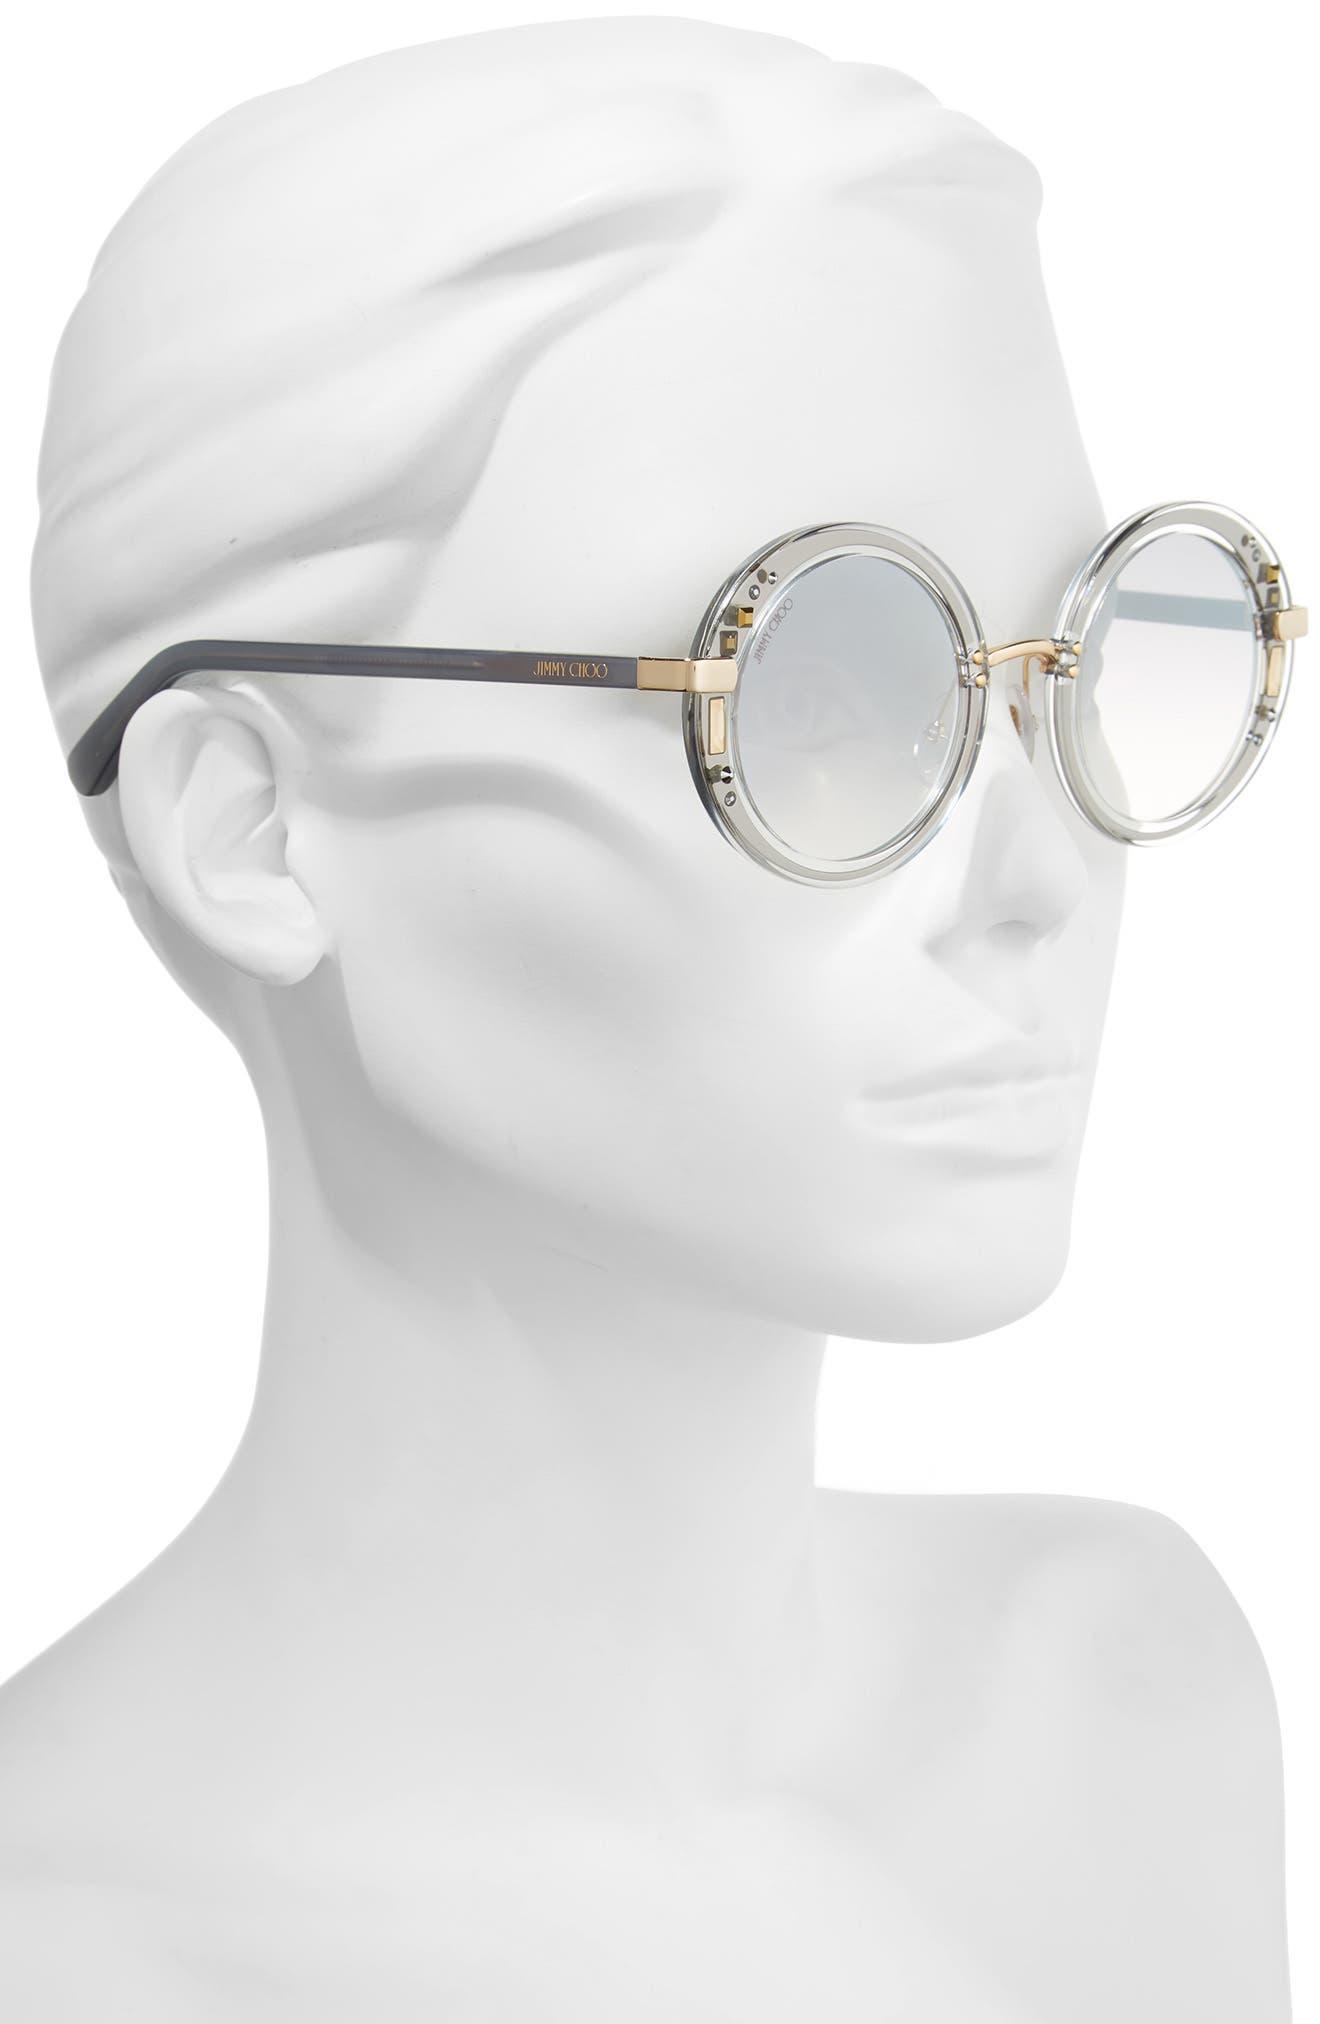 Gems 48mm Round Sunglasses,                             Alternate thumbnail 2, color,                             Crystal/ Ruthenium/ Grey